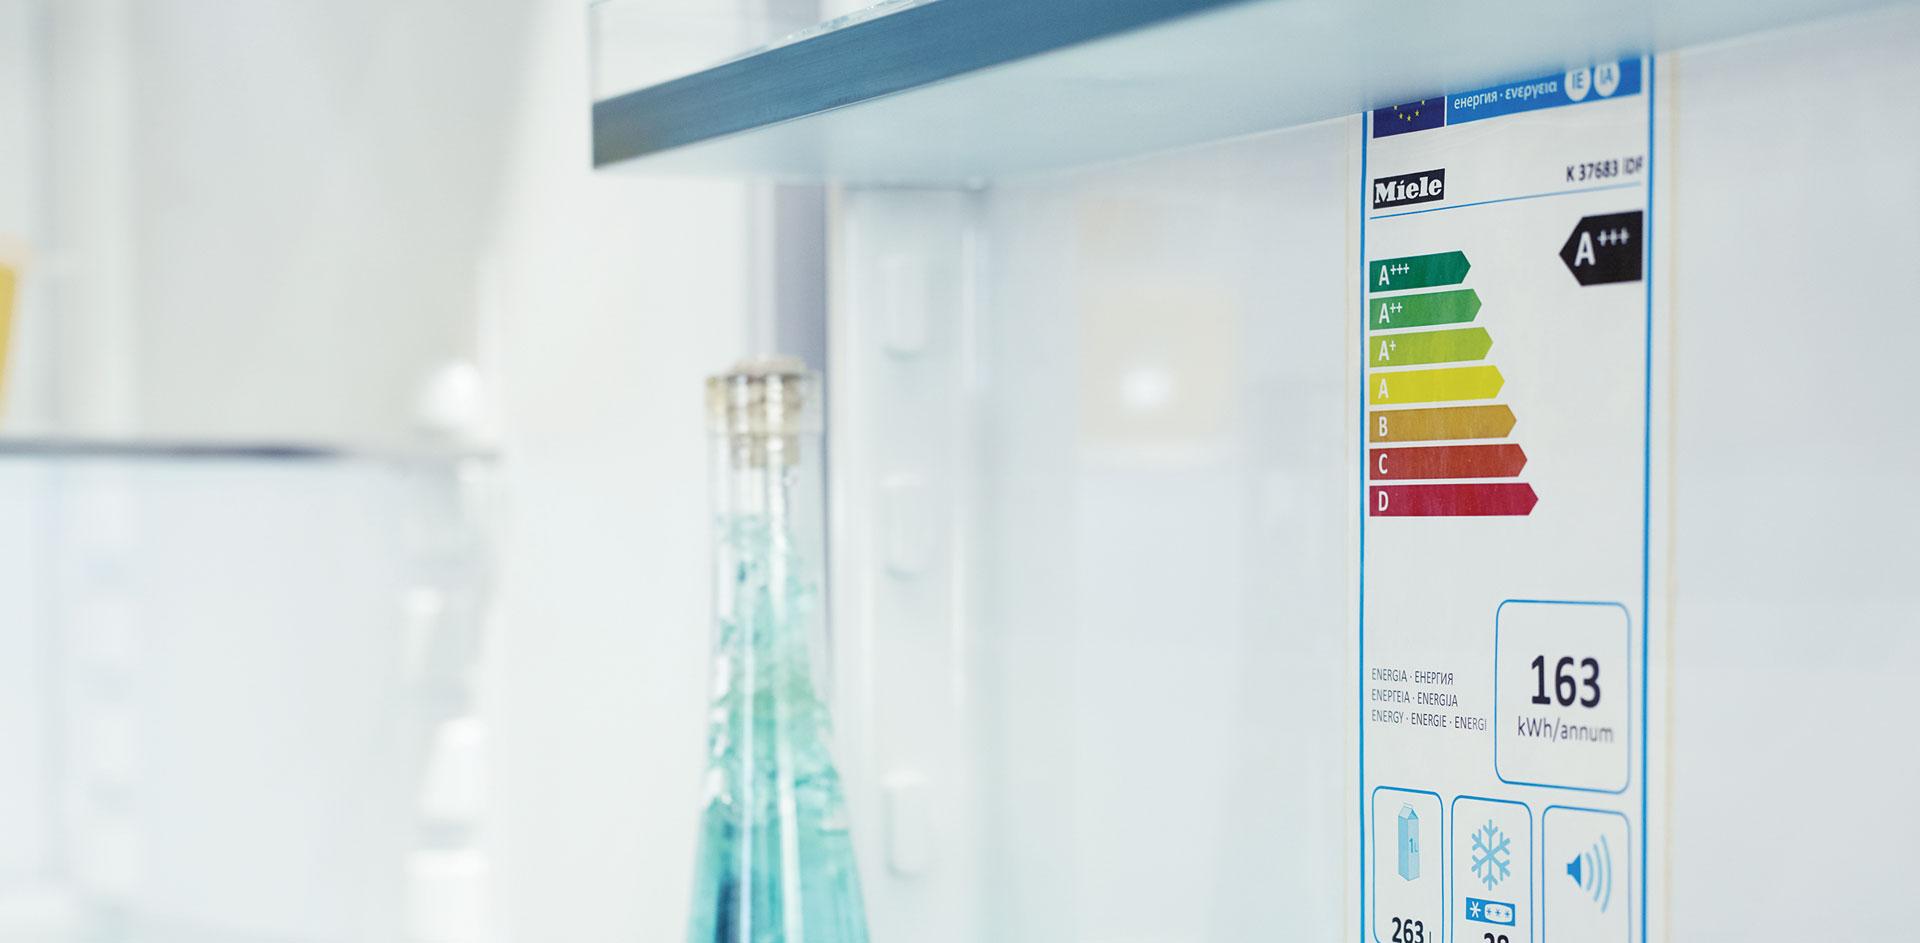 choisir frigo finest que choisir frigo porte telefunken tfnvinblk choisir un frigo congelateur. Black Bedroom Furniture Sets. Home Design Ideas